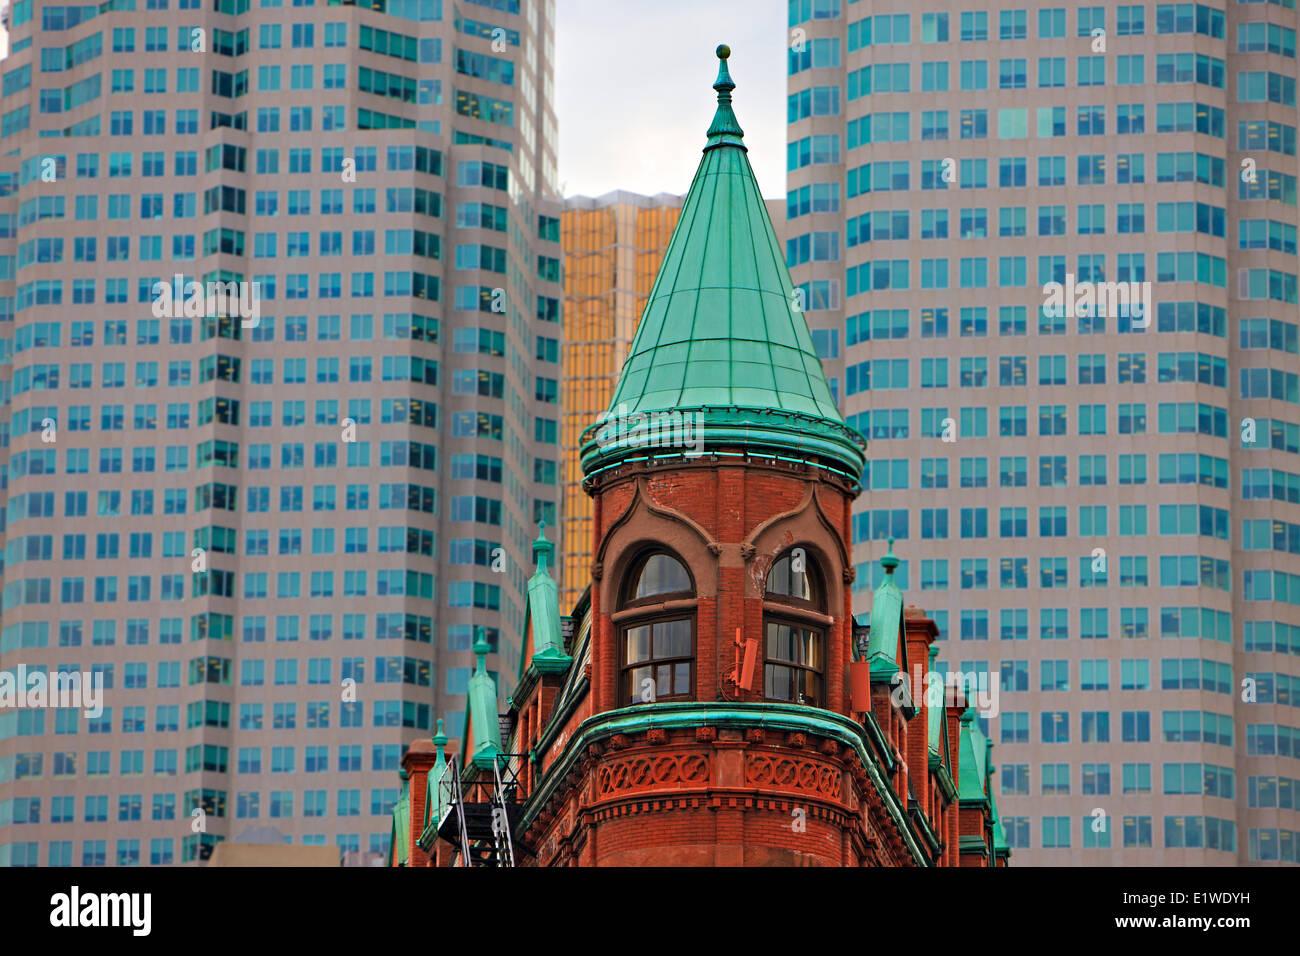 Gooderham Building (Flatiron Building) in downtown Toronto City, Ontario, Canada. - Stock Image